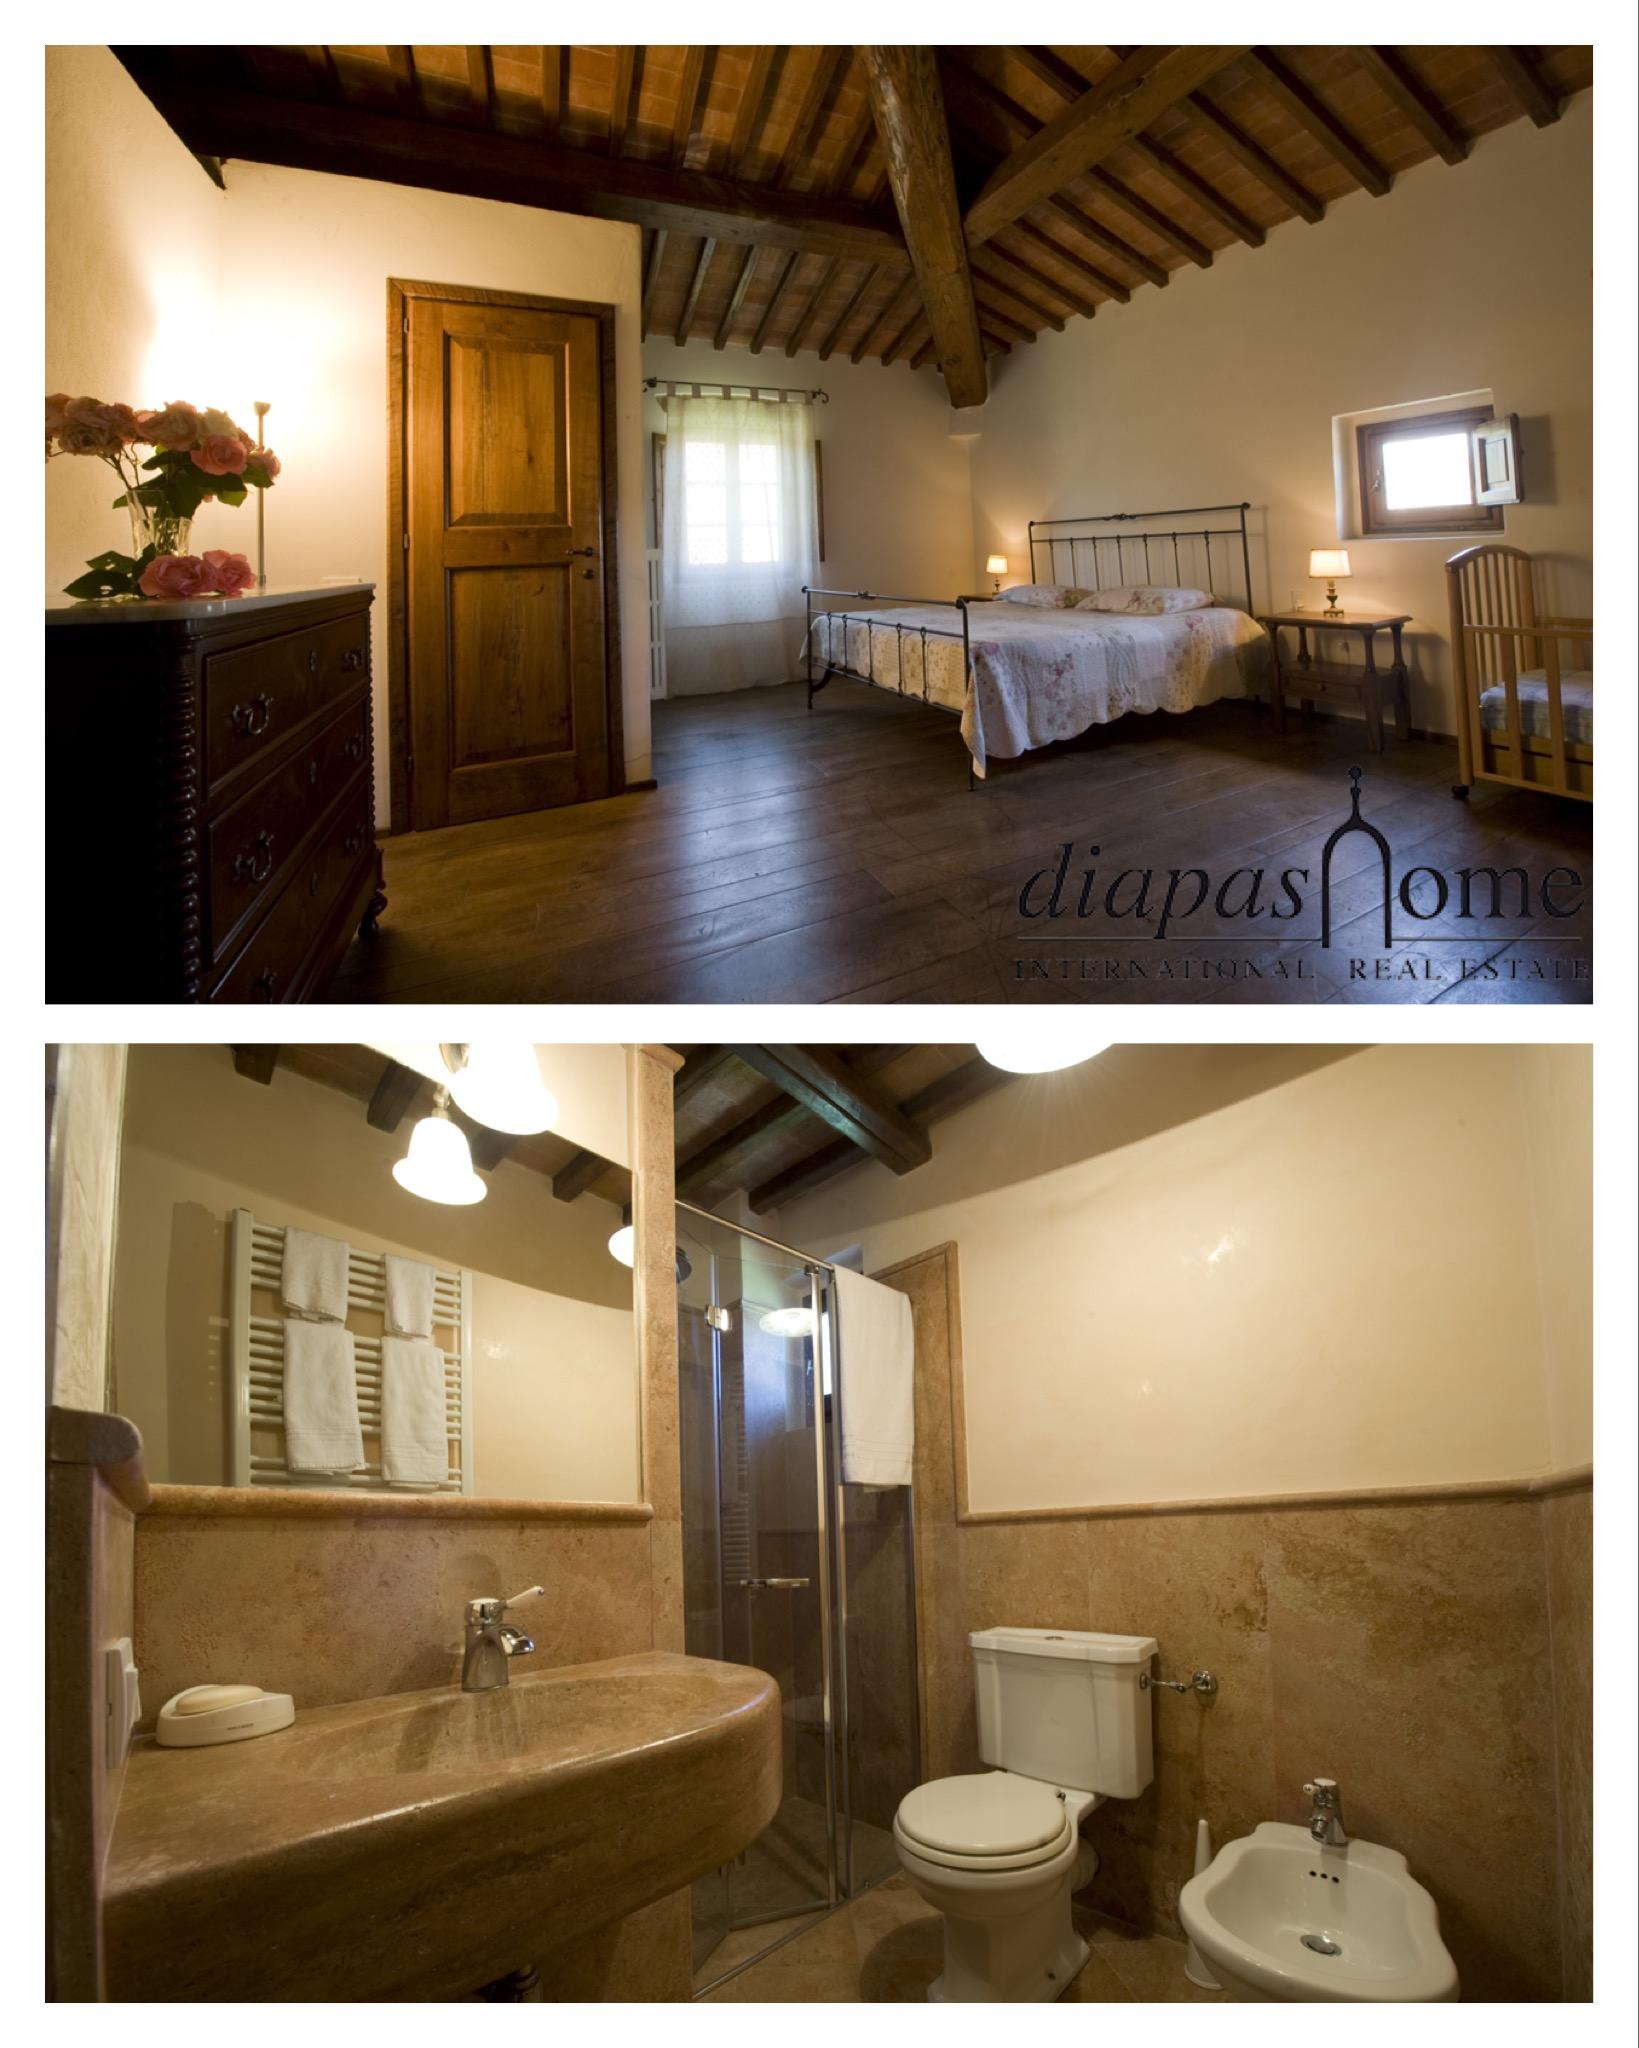 villa, carmignano,diapashome,real,estate_18